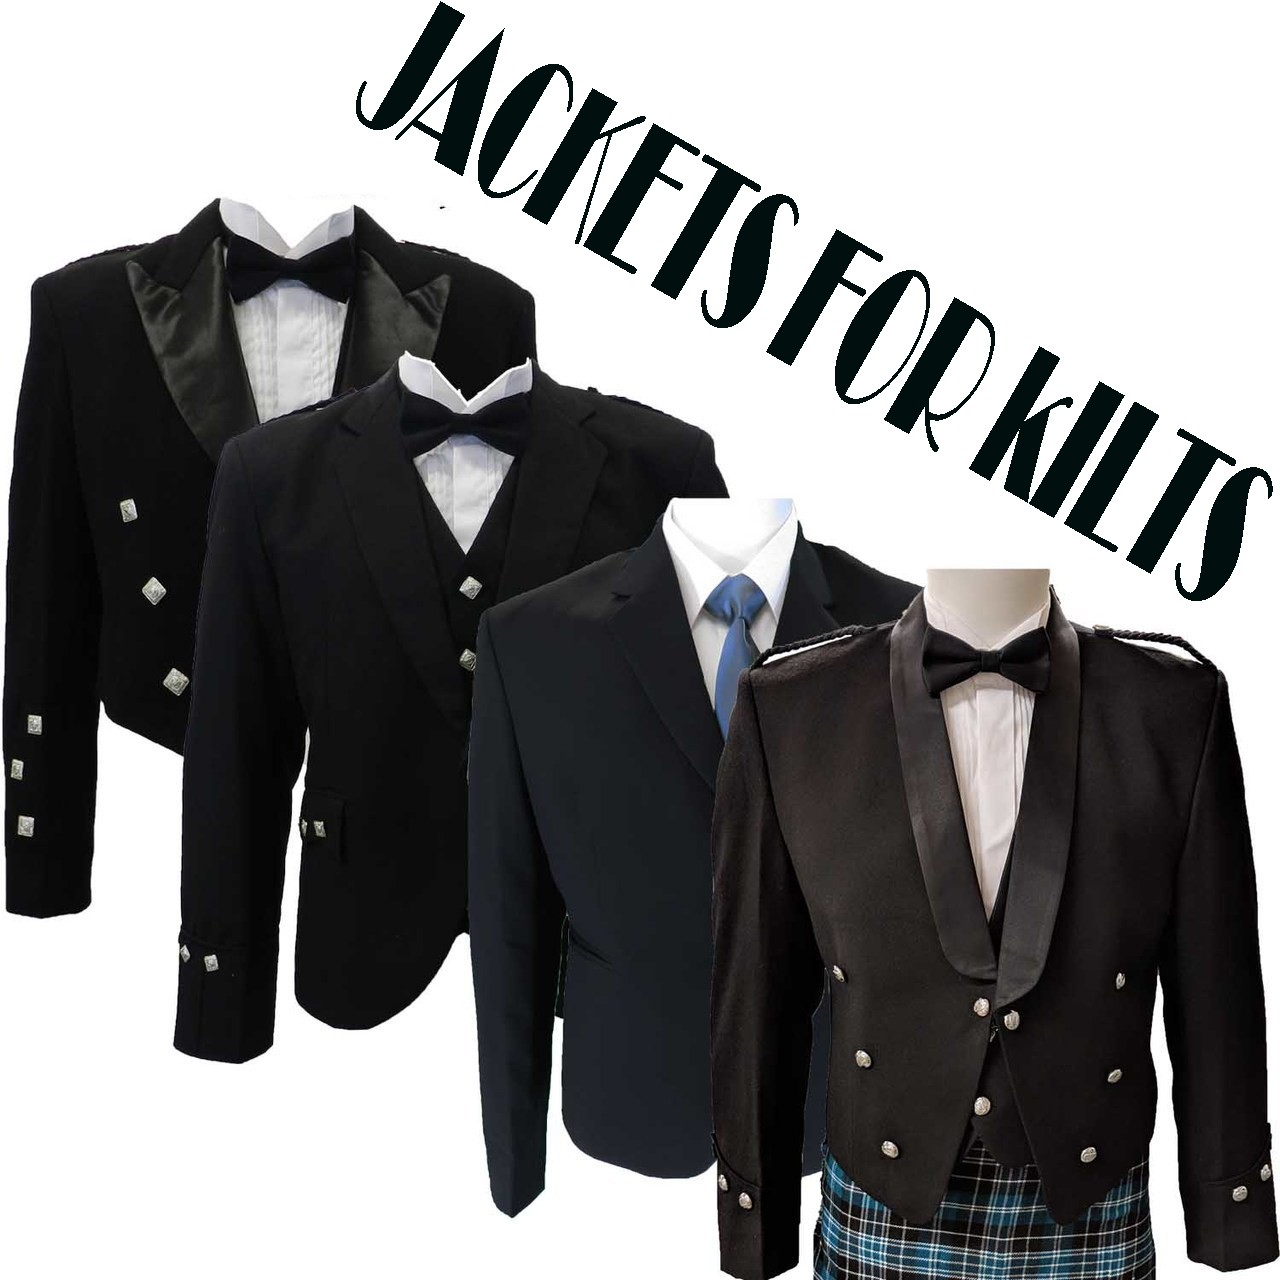 Type of Jacket